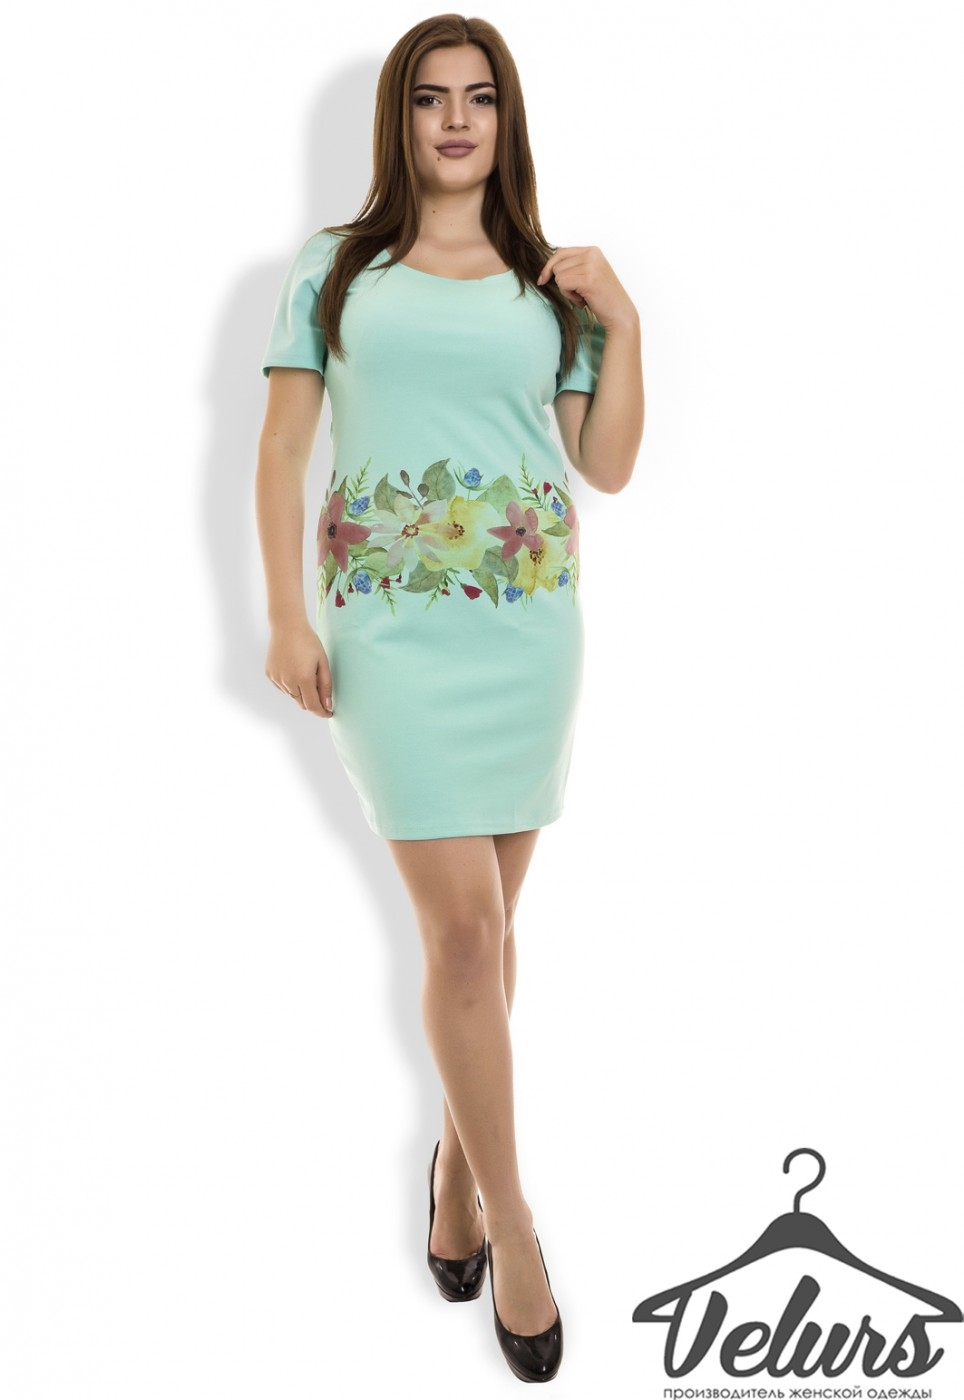 Velurs: Платье 212126 - фото 19